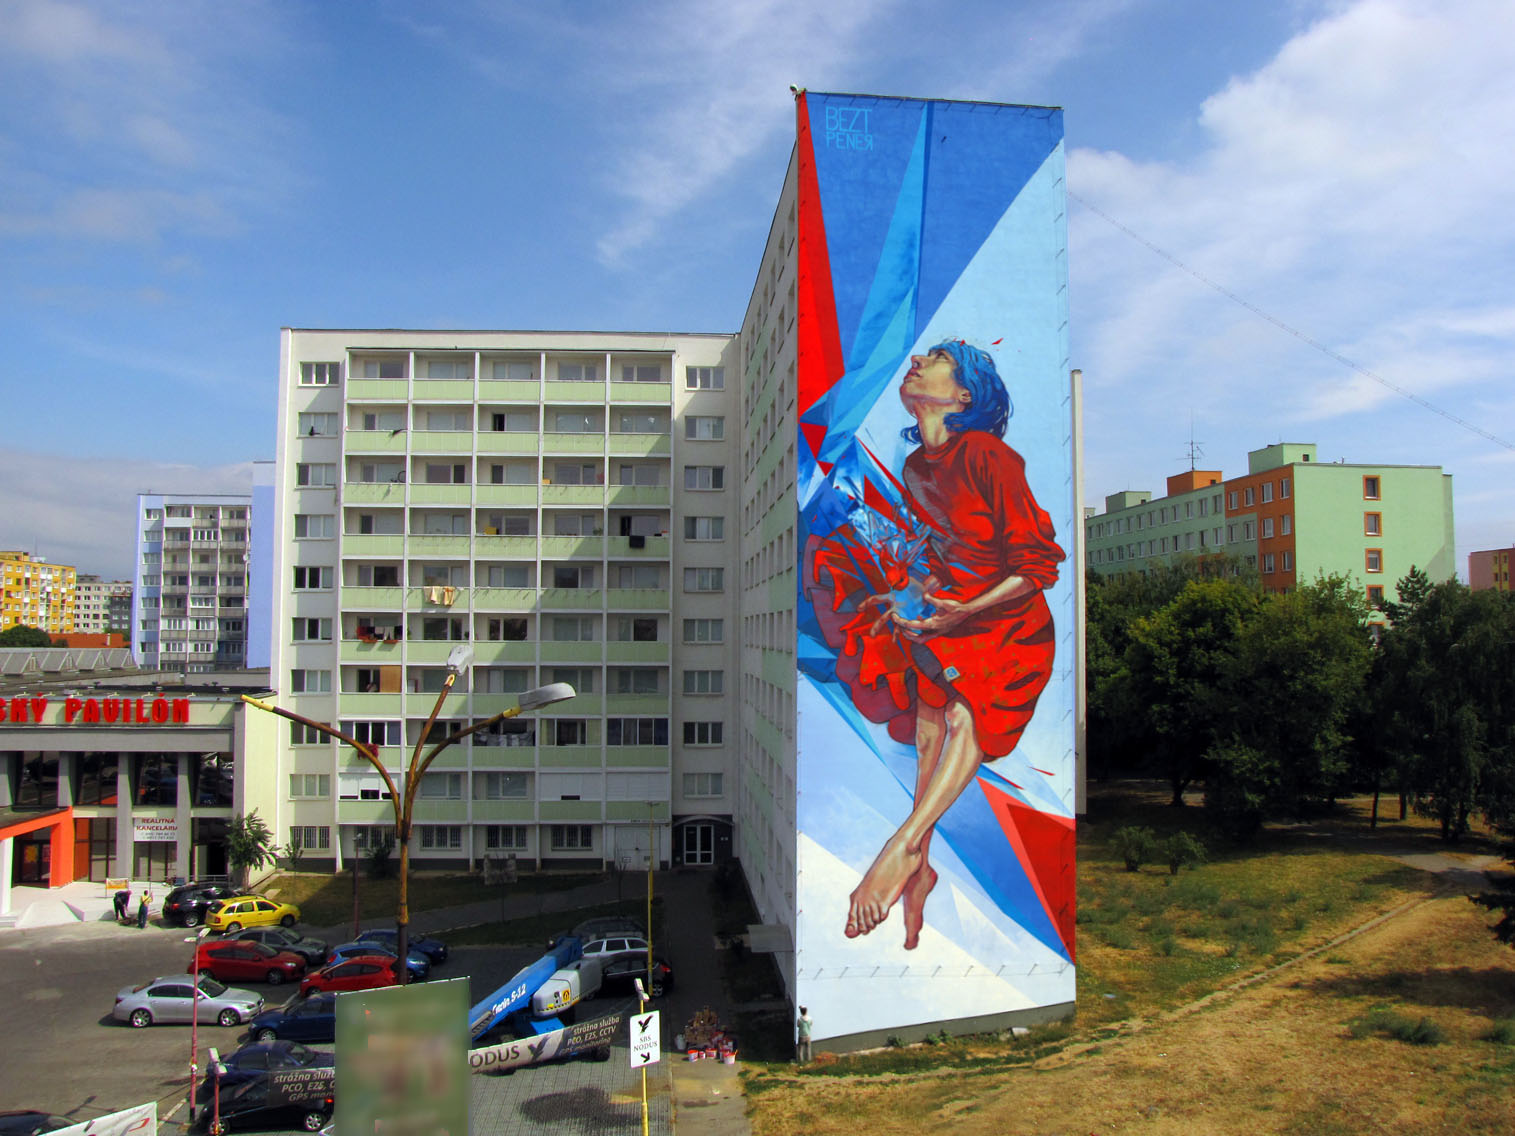 pener-betz-new-mural-in-kosice-slovakia-01